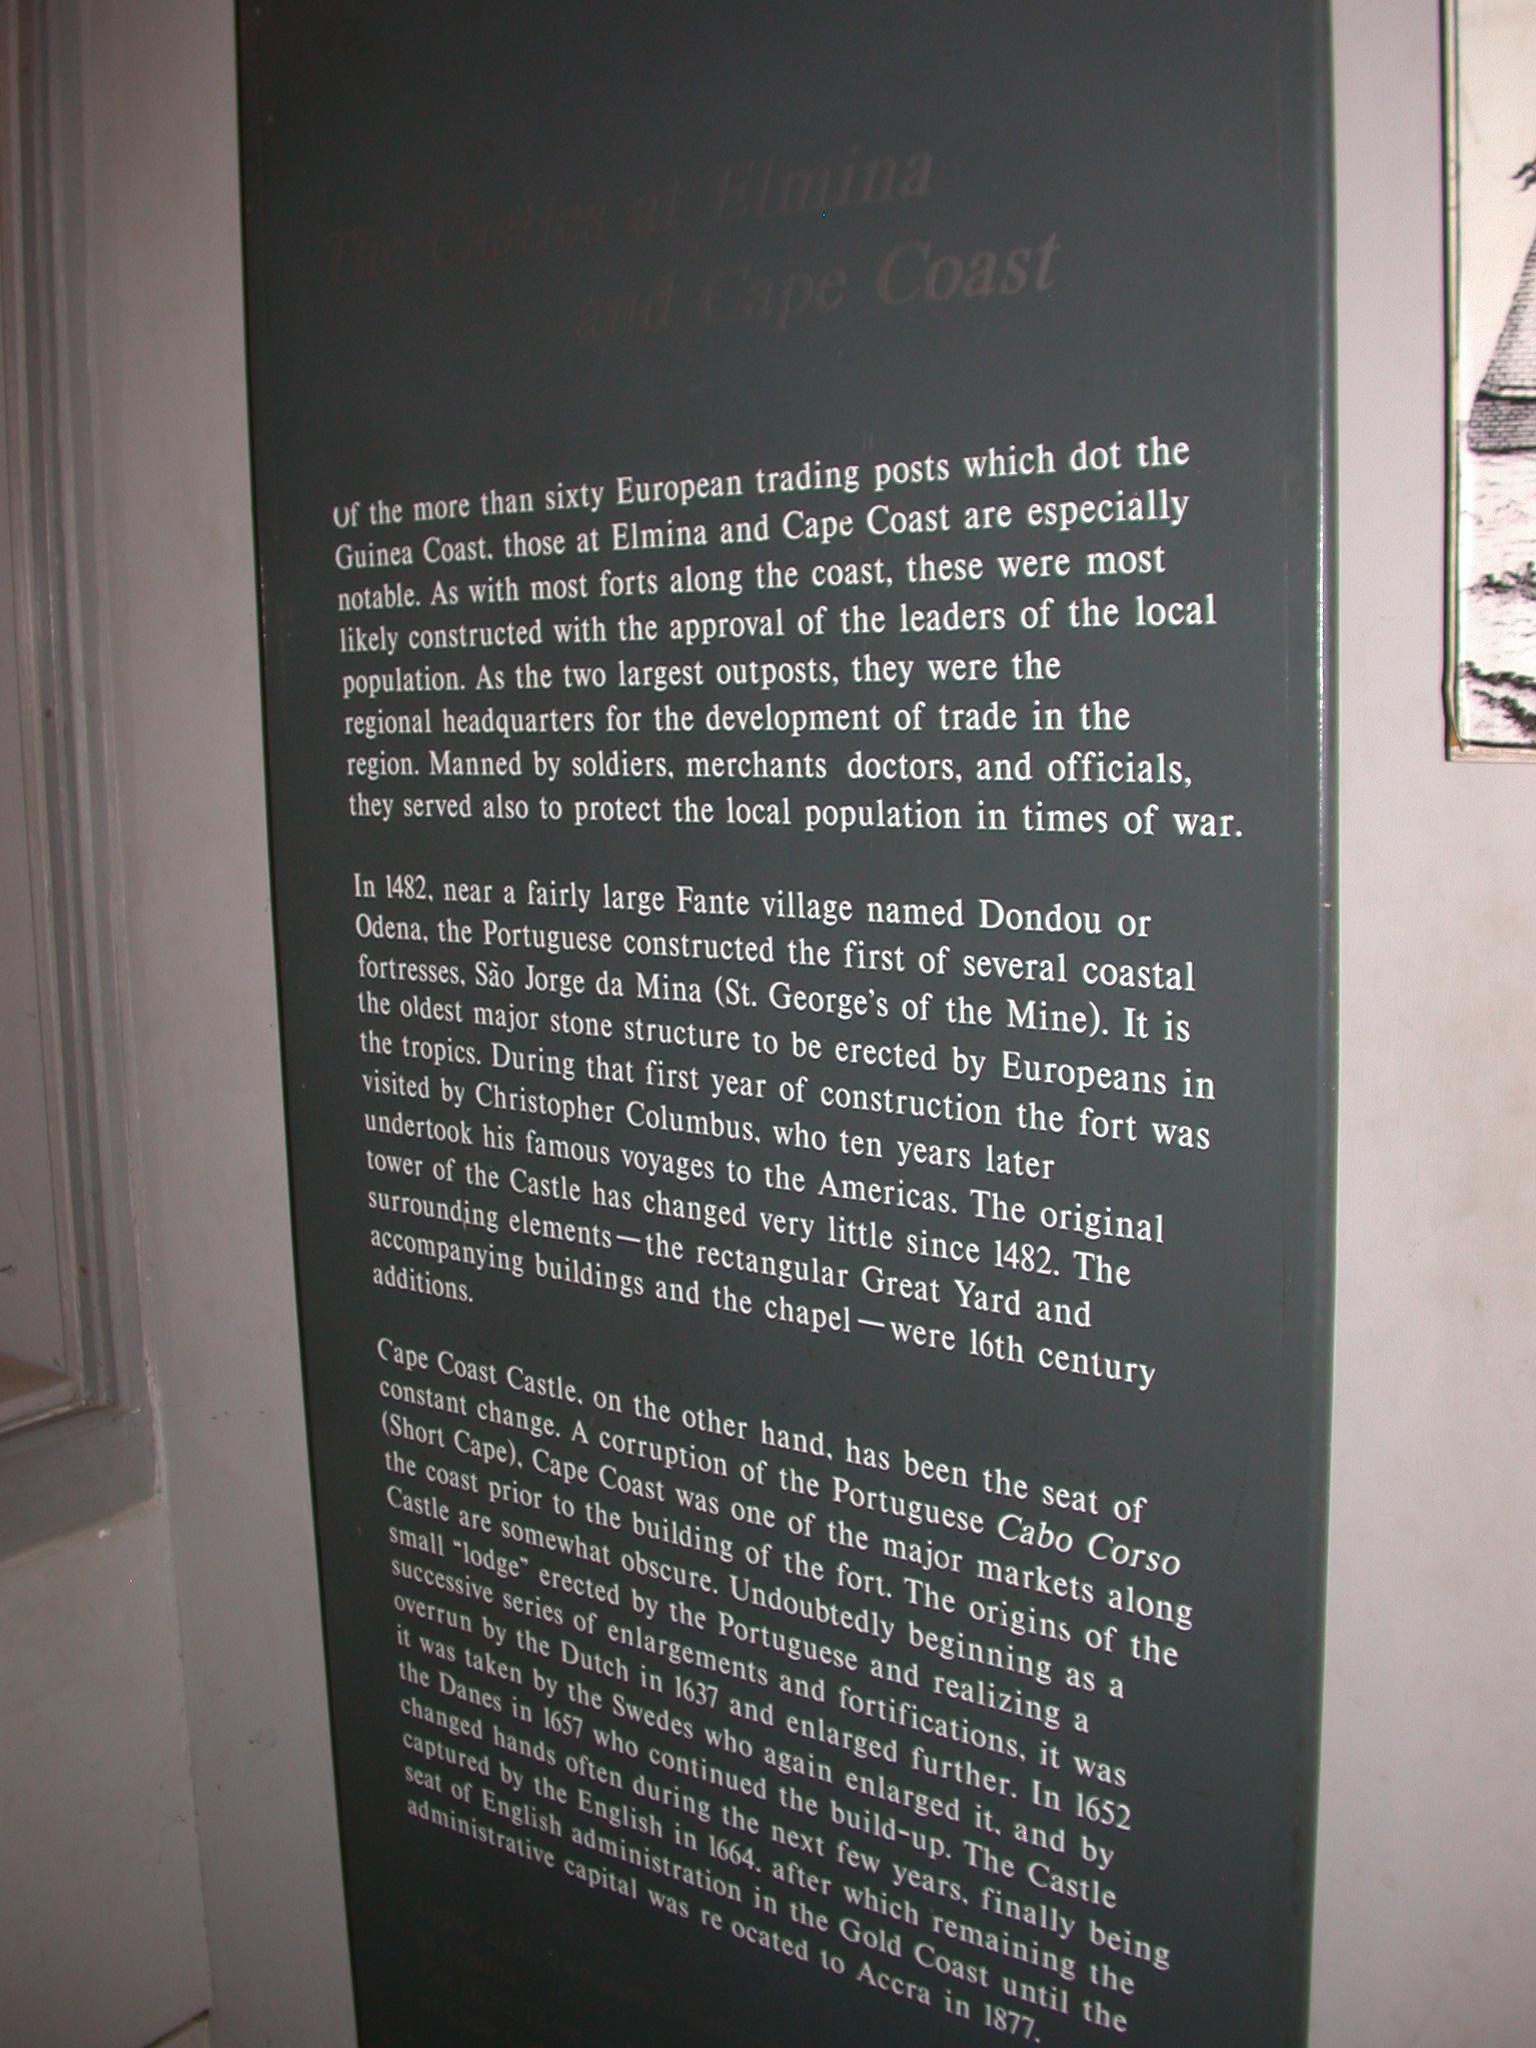 Cape Coast and Elmina History Description, Cape Coast Slave Fort Museum, Cape Coast, Ghana